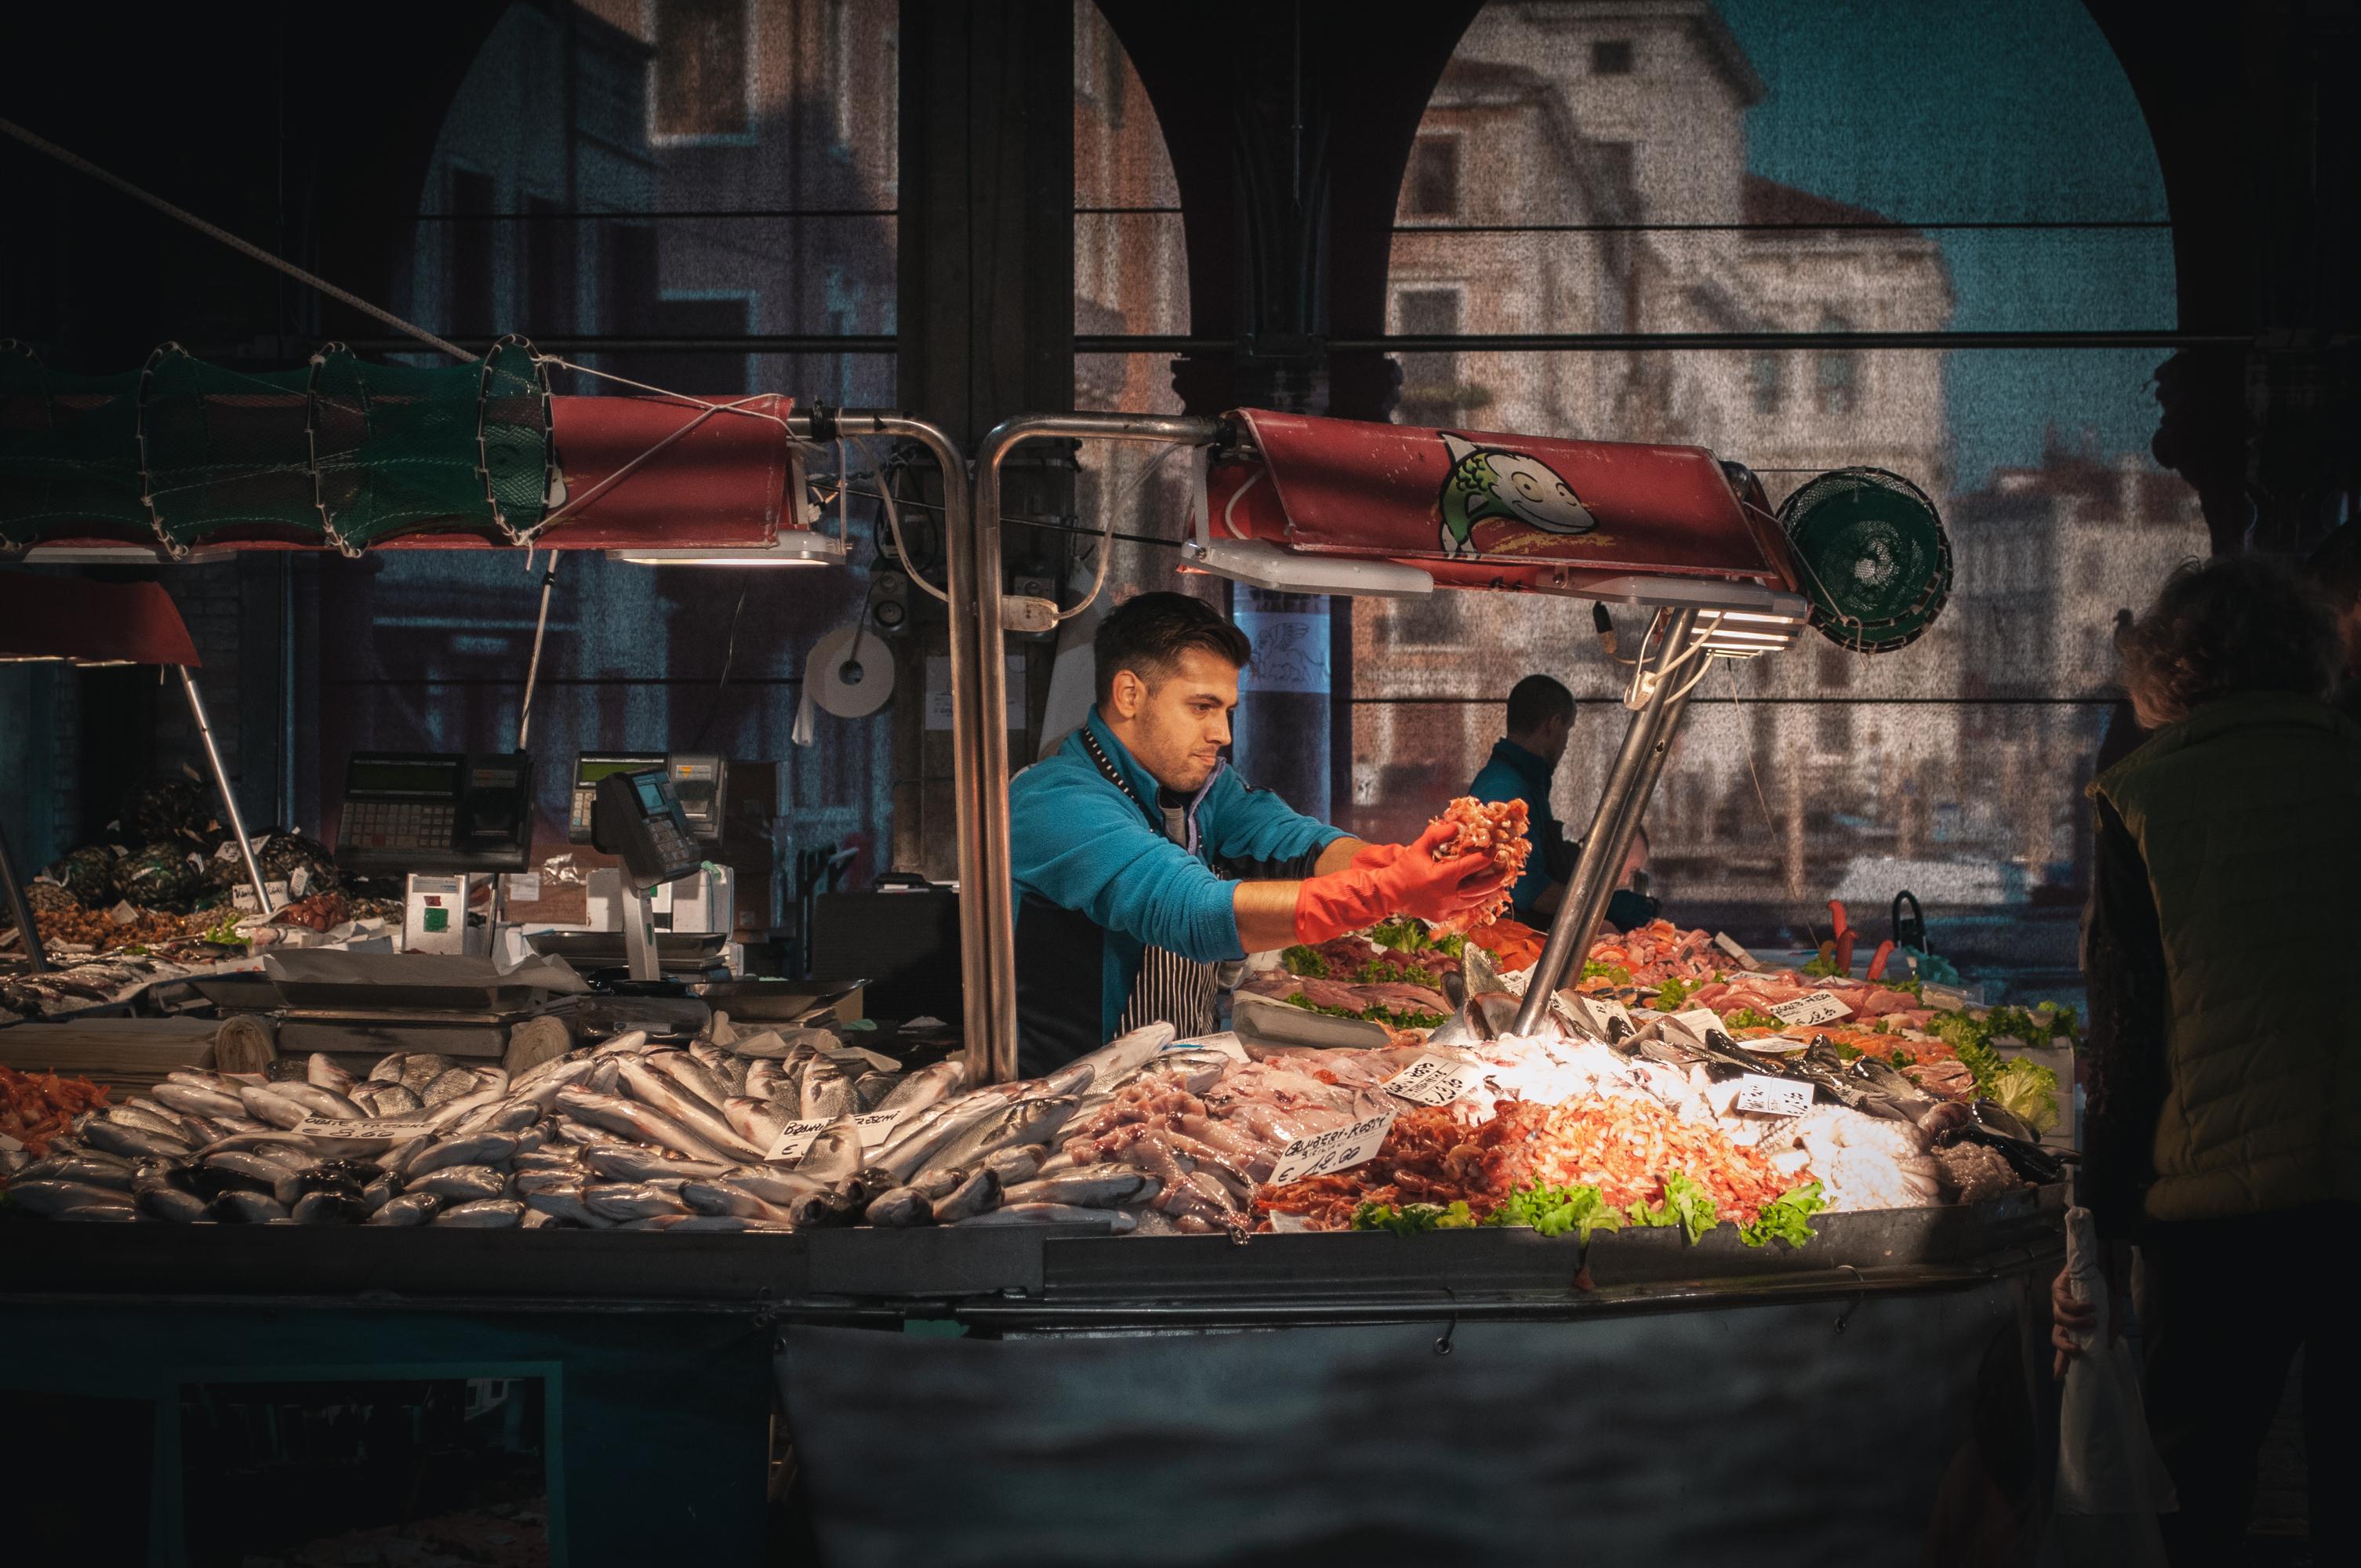 Fish and veggie Market Venice